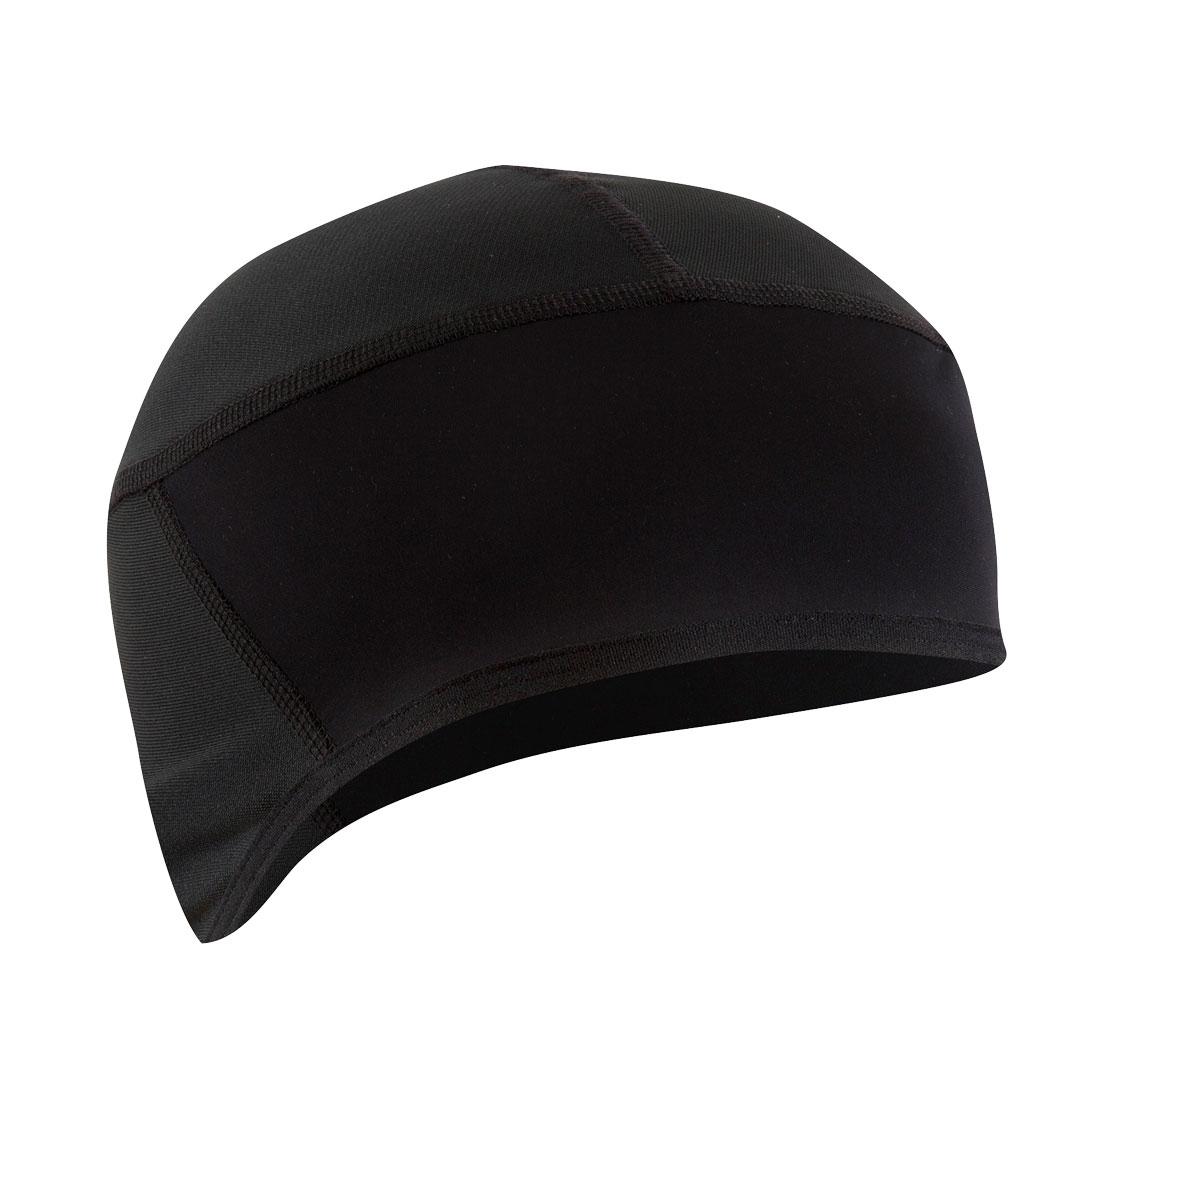 PEARL iZUMi BARRIER SKULL čepice, černá, ONE